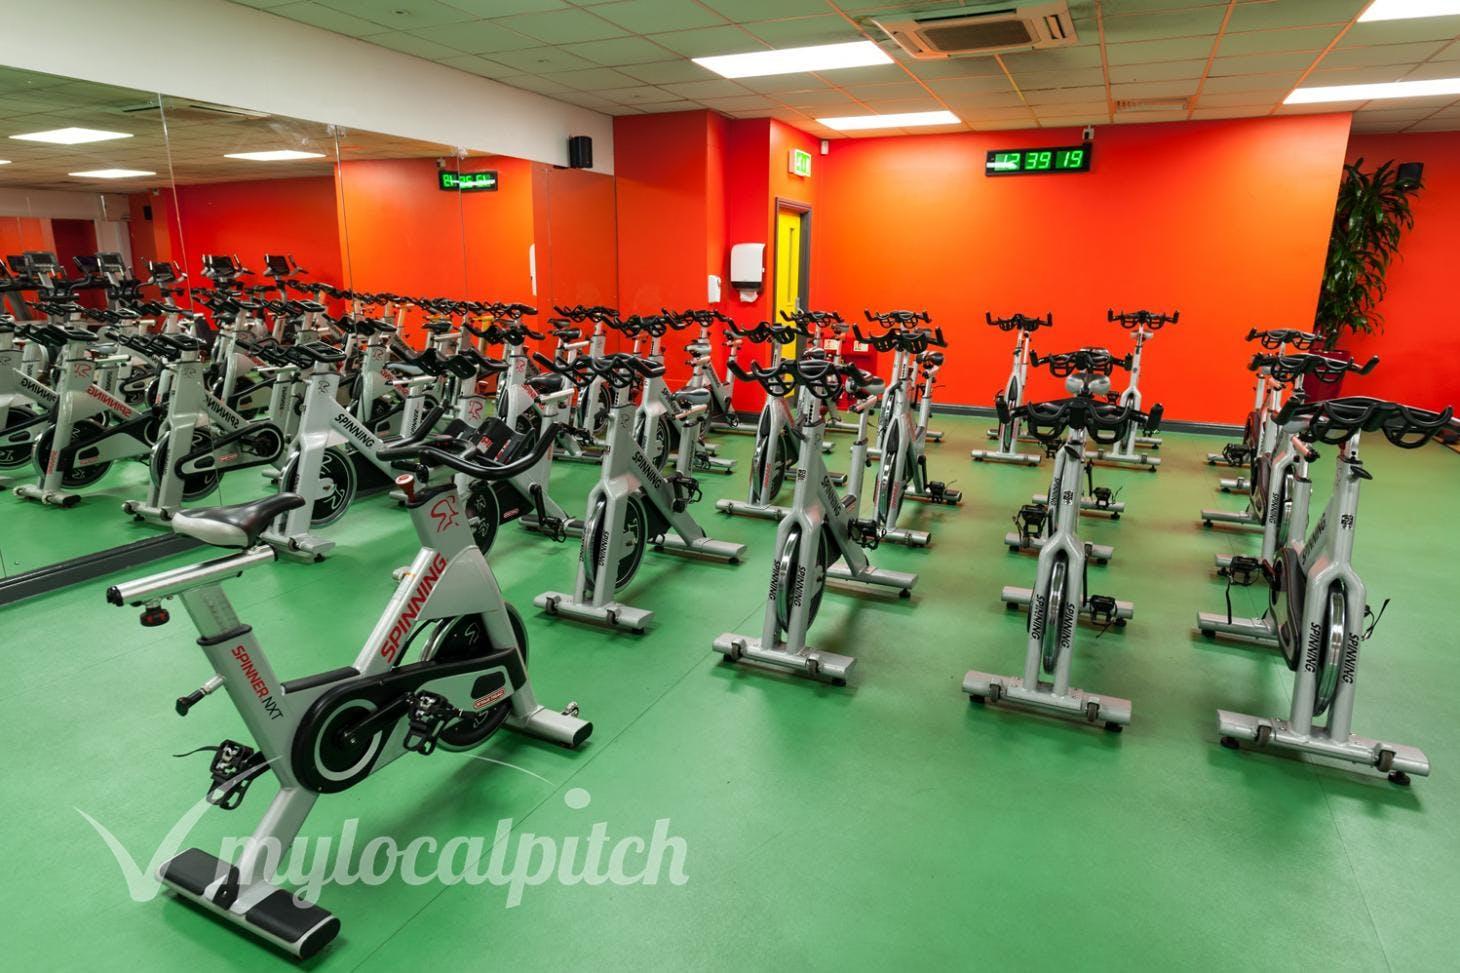 Eccles Leisure Centre Gym gym